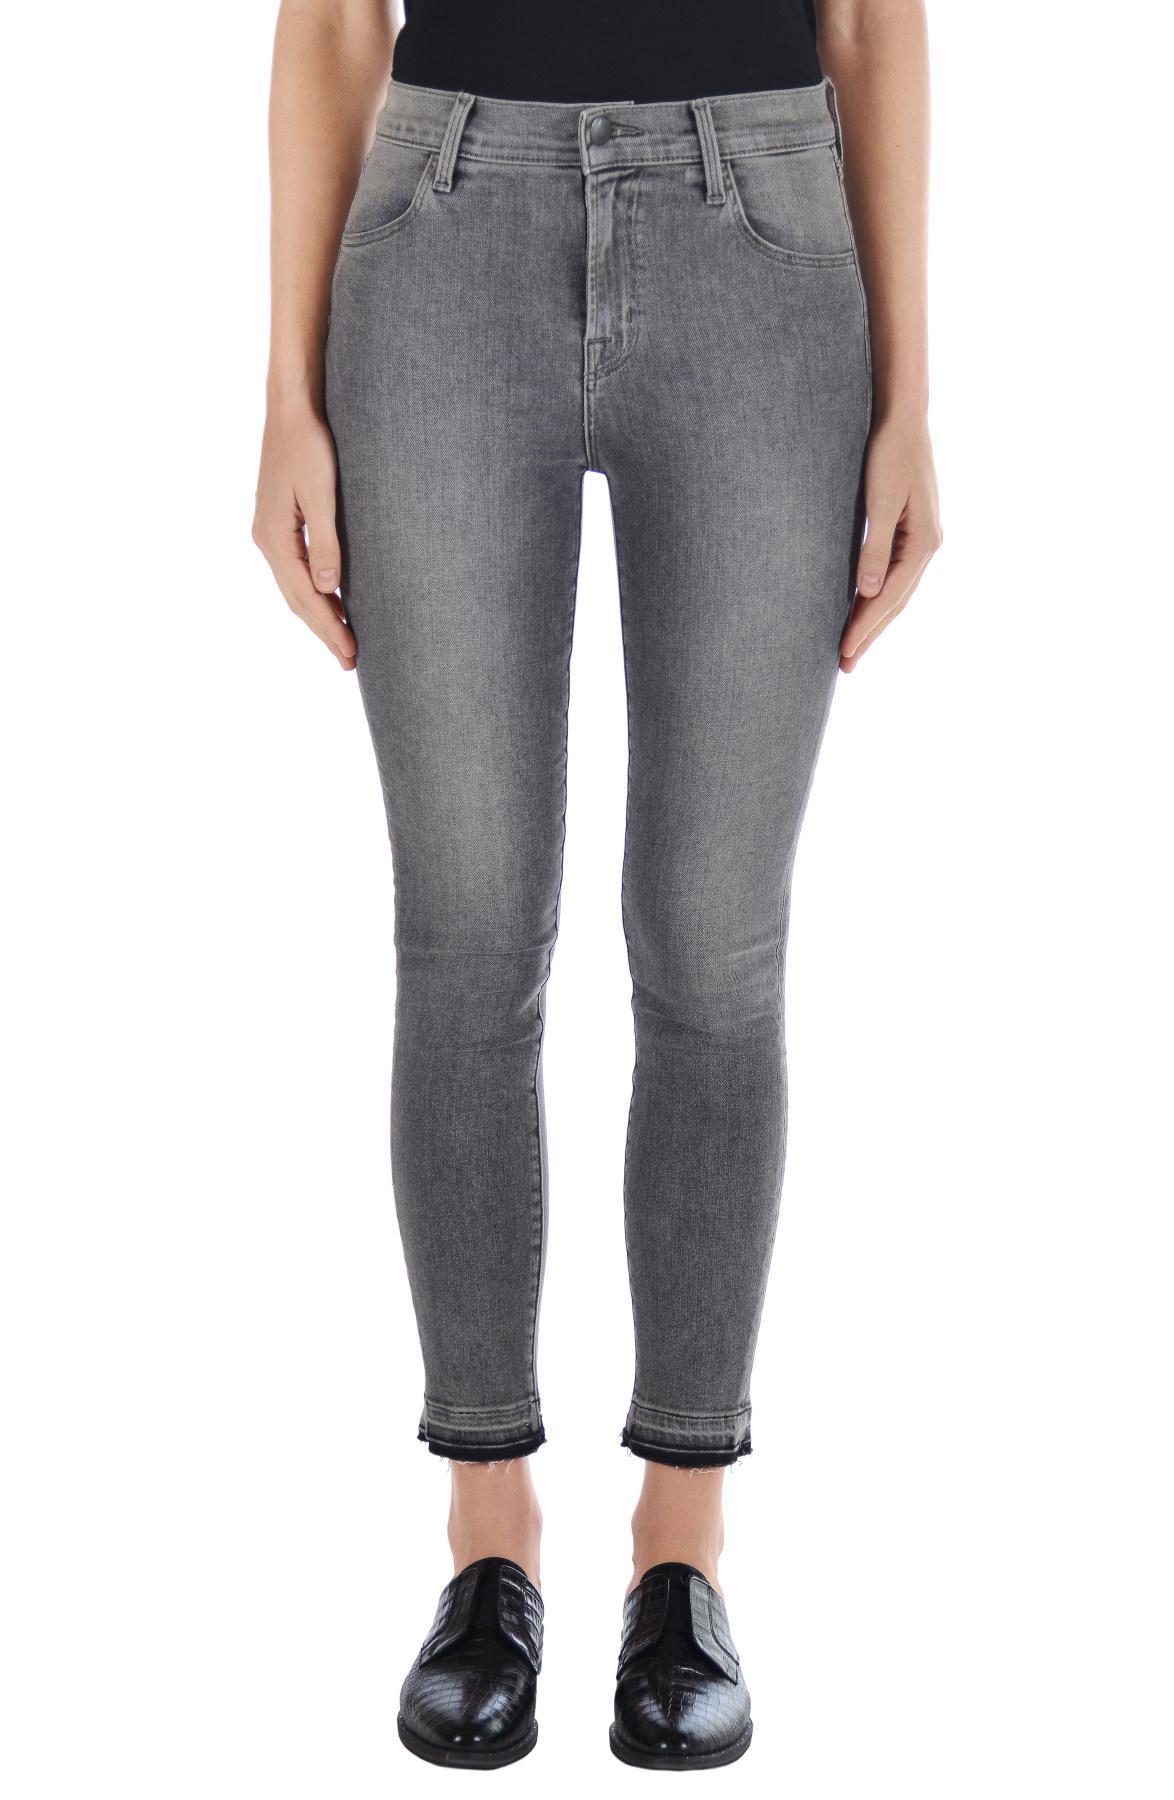 92fa1a121e3d J Brand Alana High-rise Cropped Super Skinny In Earl Grey in Gray - Lyst